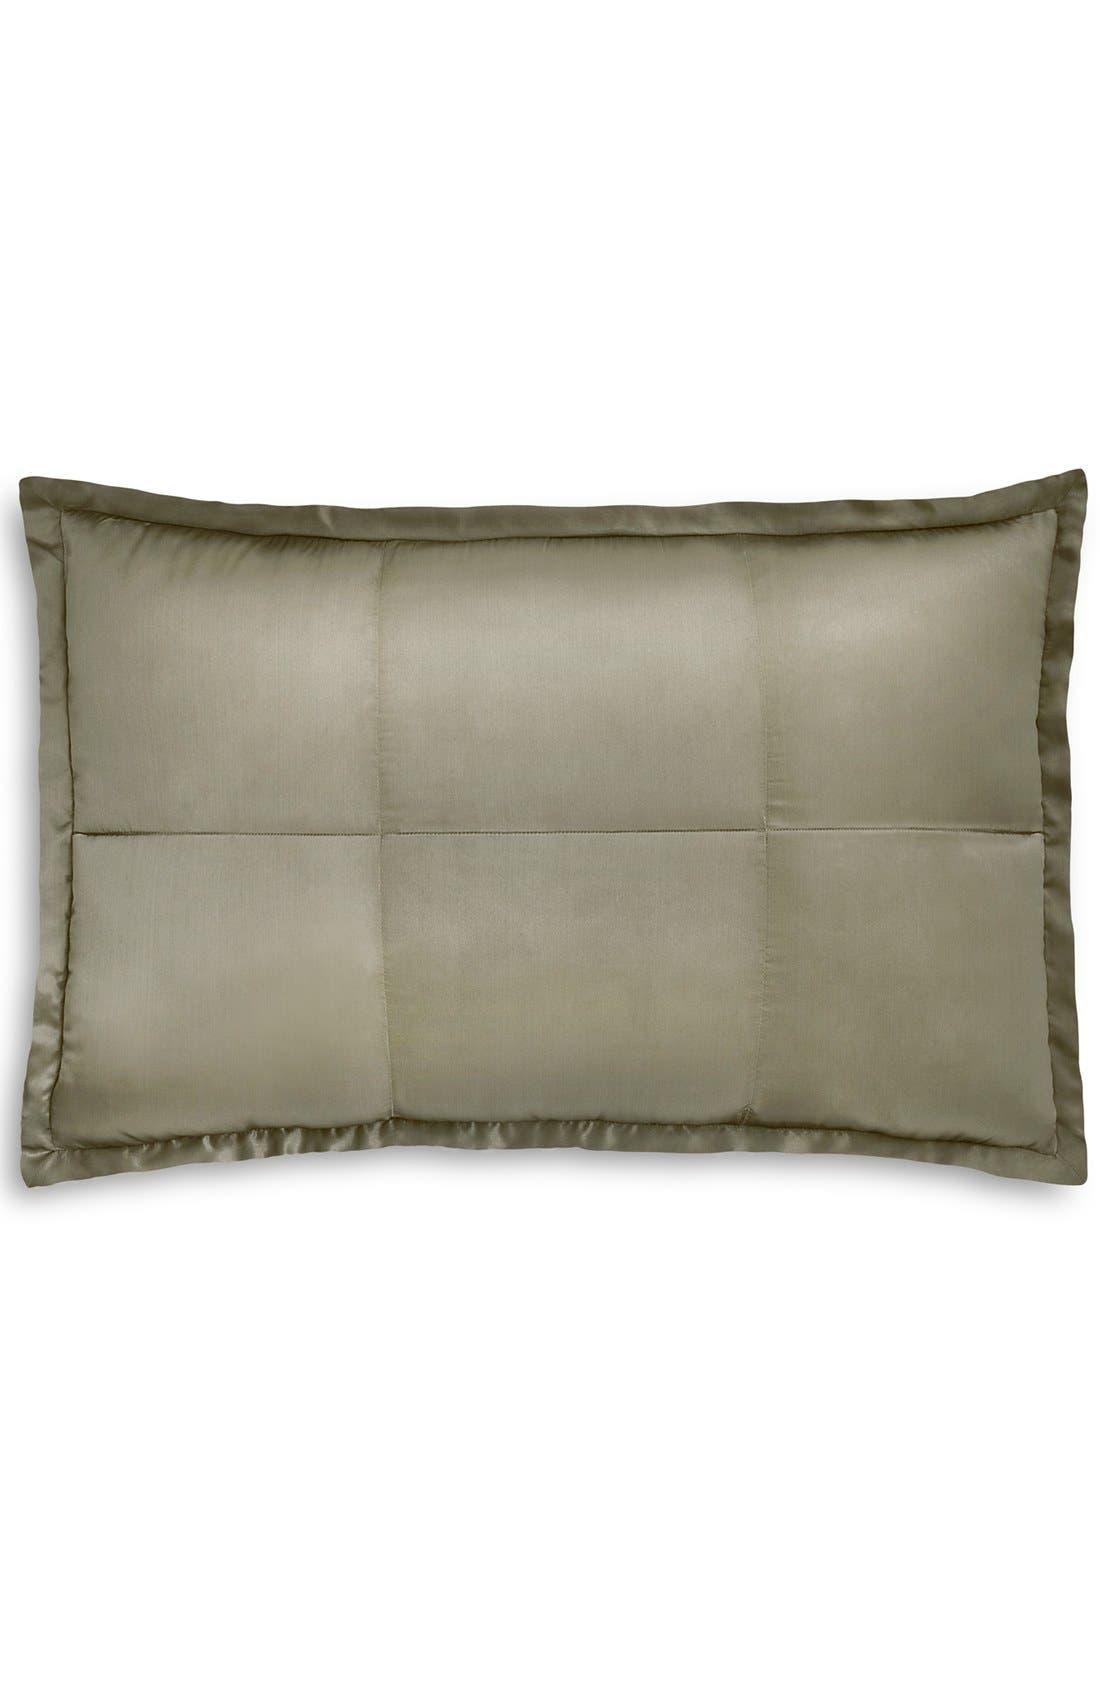 Alternate Image 1 Selected - Donna Karan 'Modern Classics' Silk & Cotton Quilted Pillow Sham (Online Only)